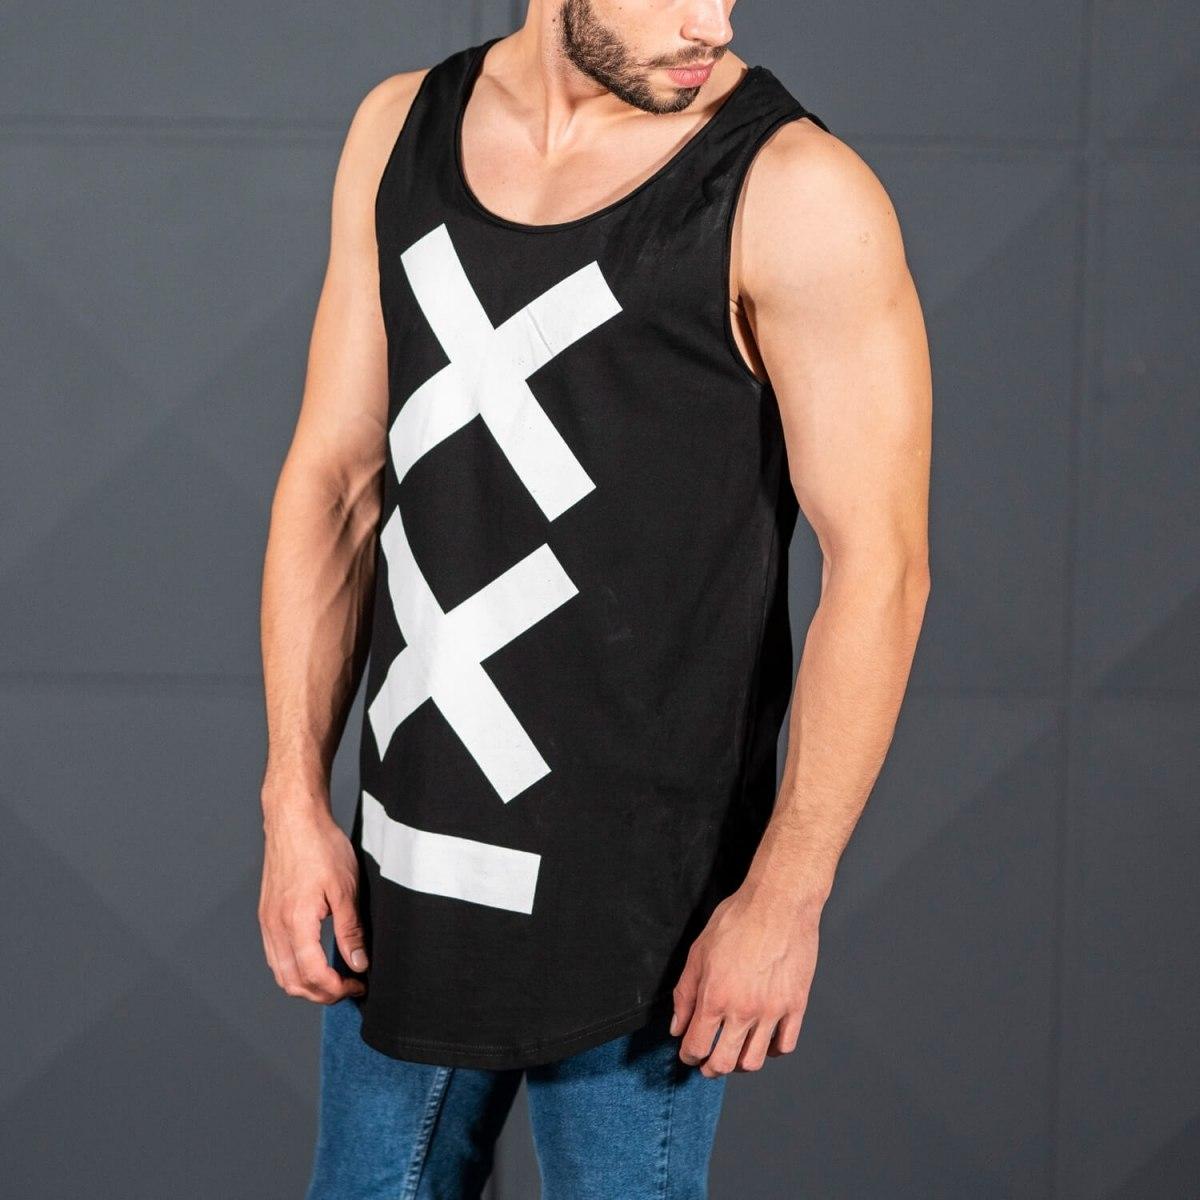 Men's Athletic Sleeveless XX Tall Tank Top Black Mv Premium Brand - 1